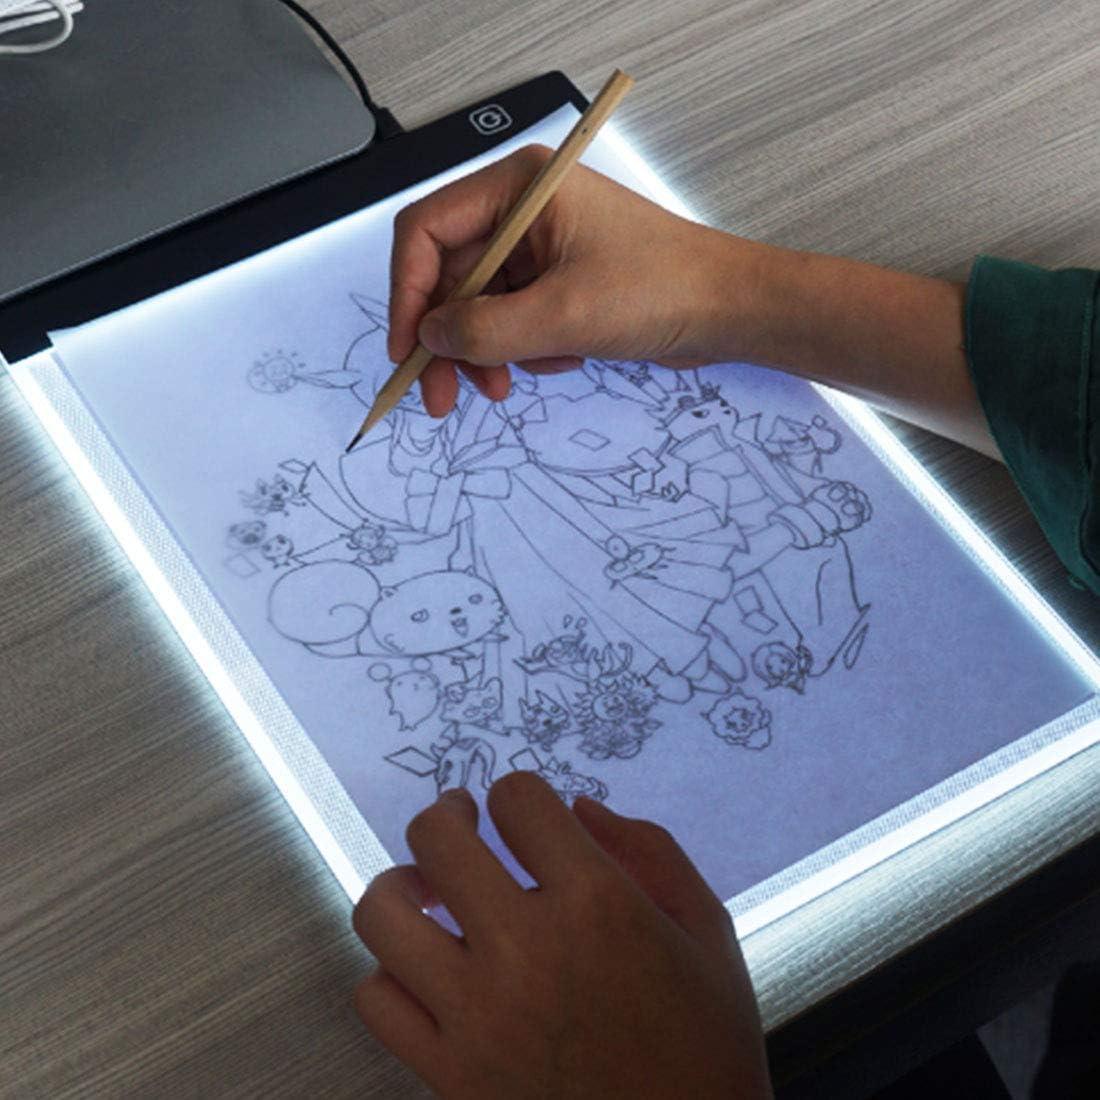 Zongxinkeji Digital Drawing Board 5W 5V Max 60% OFF Brigh of LED Three Level Max 89% OFF